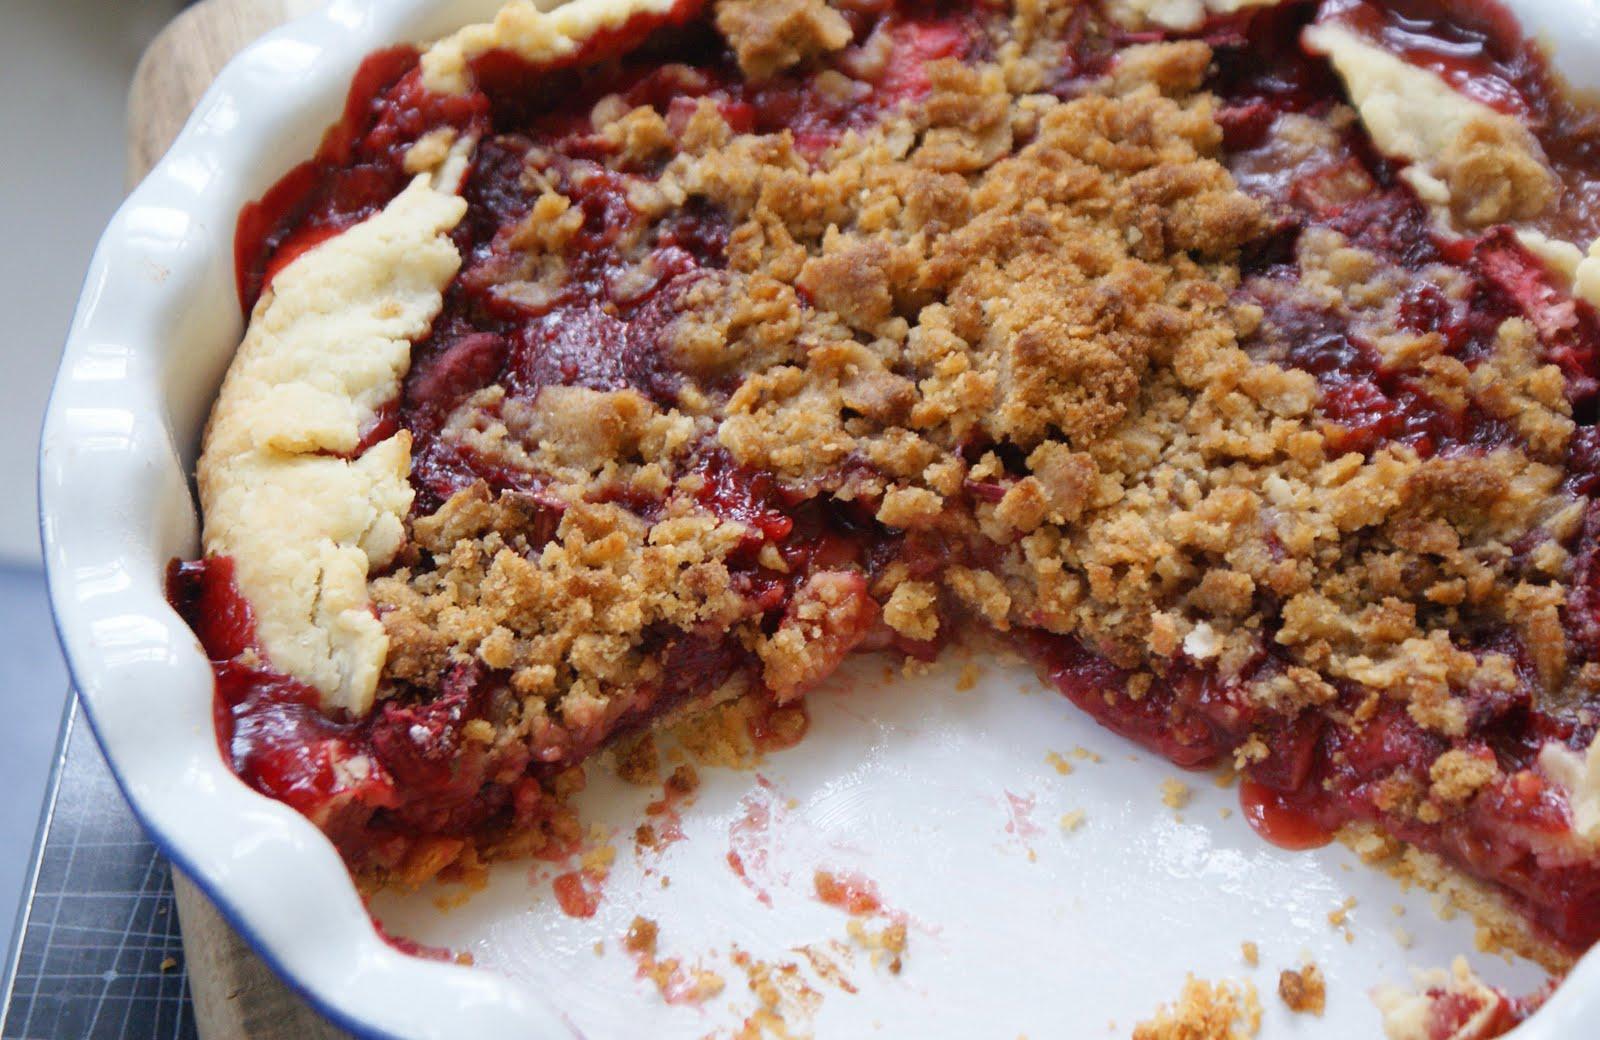 Strawberry Rhubarb Pie with Sour Cream Ice Cream - Dinner ...